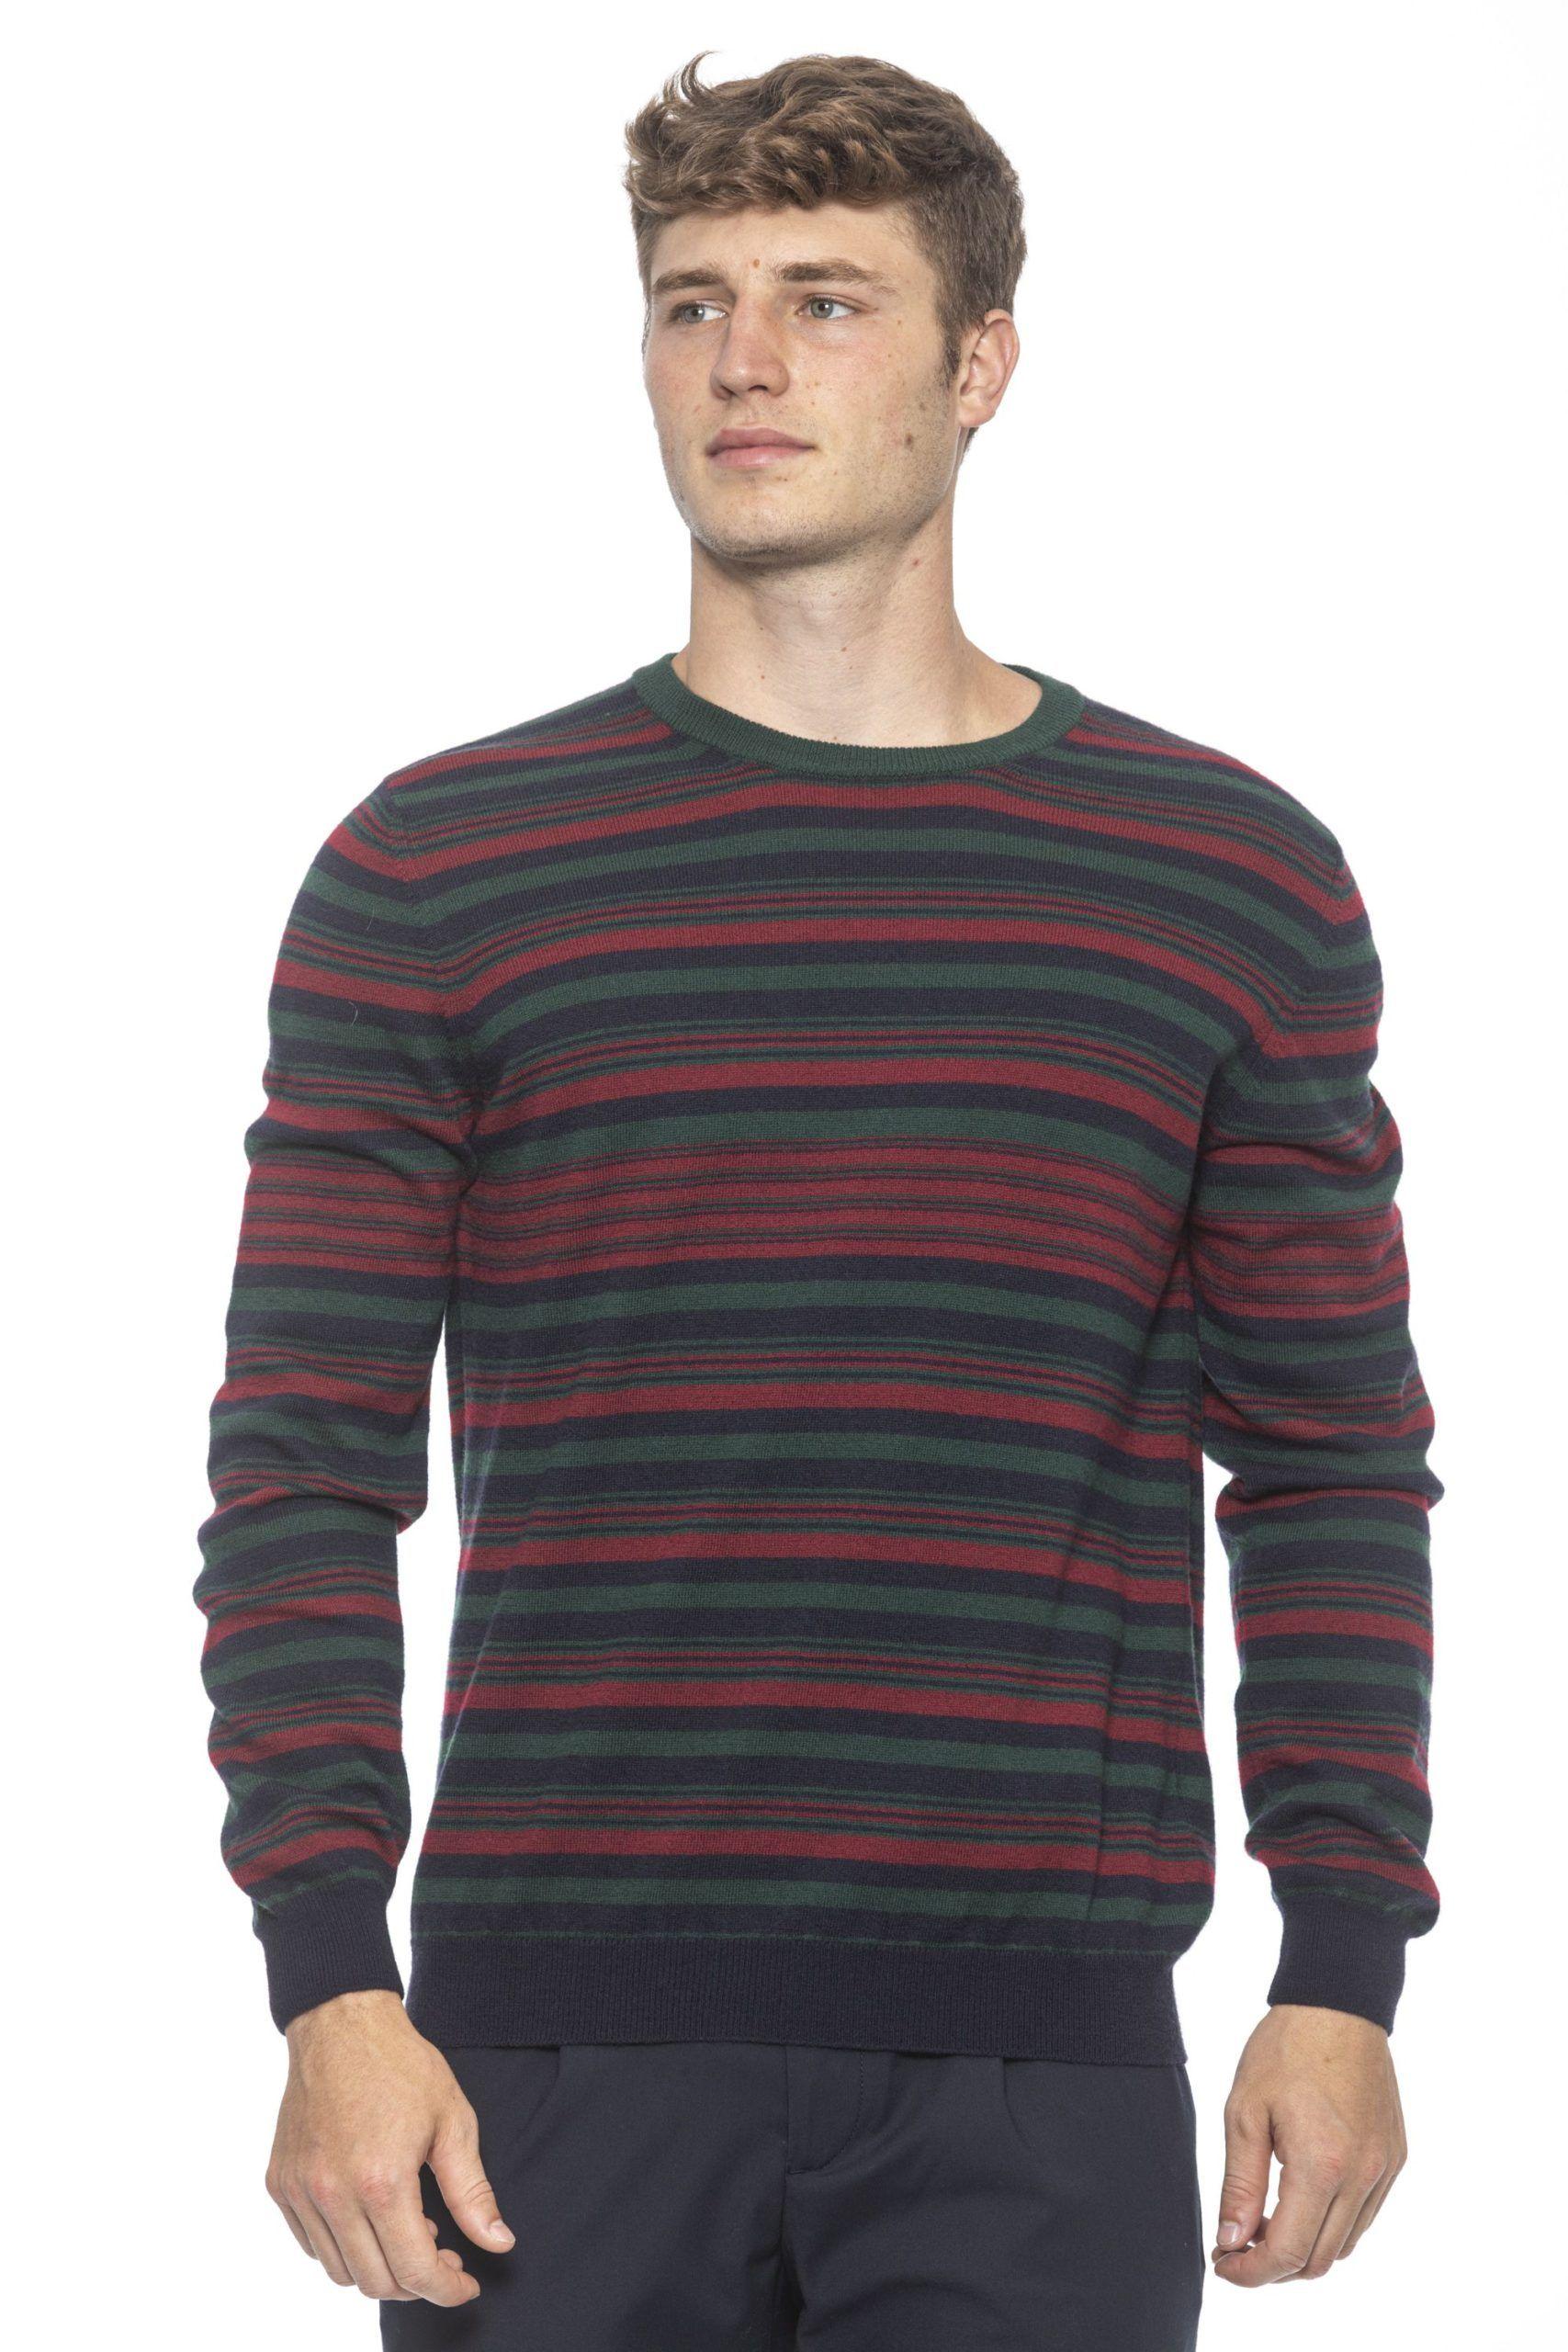 Alpha Studio Notte Sweater